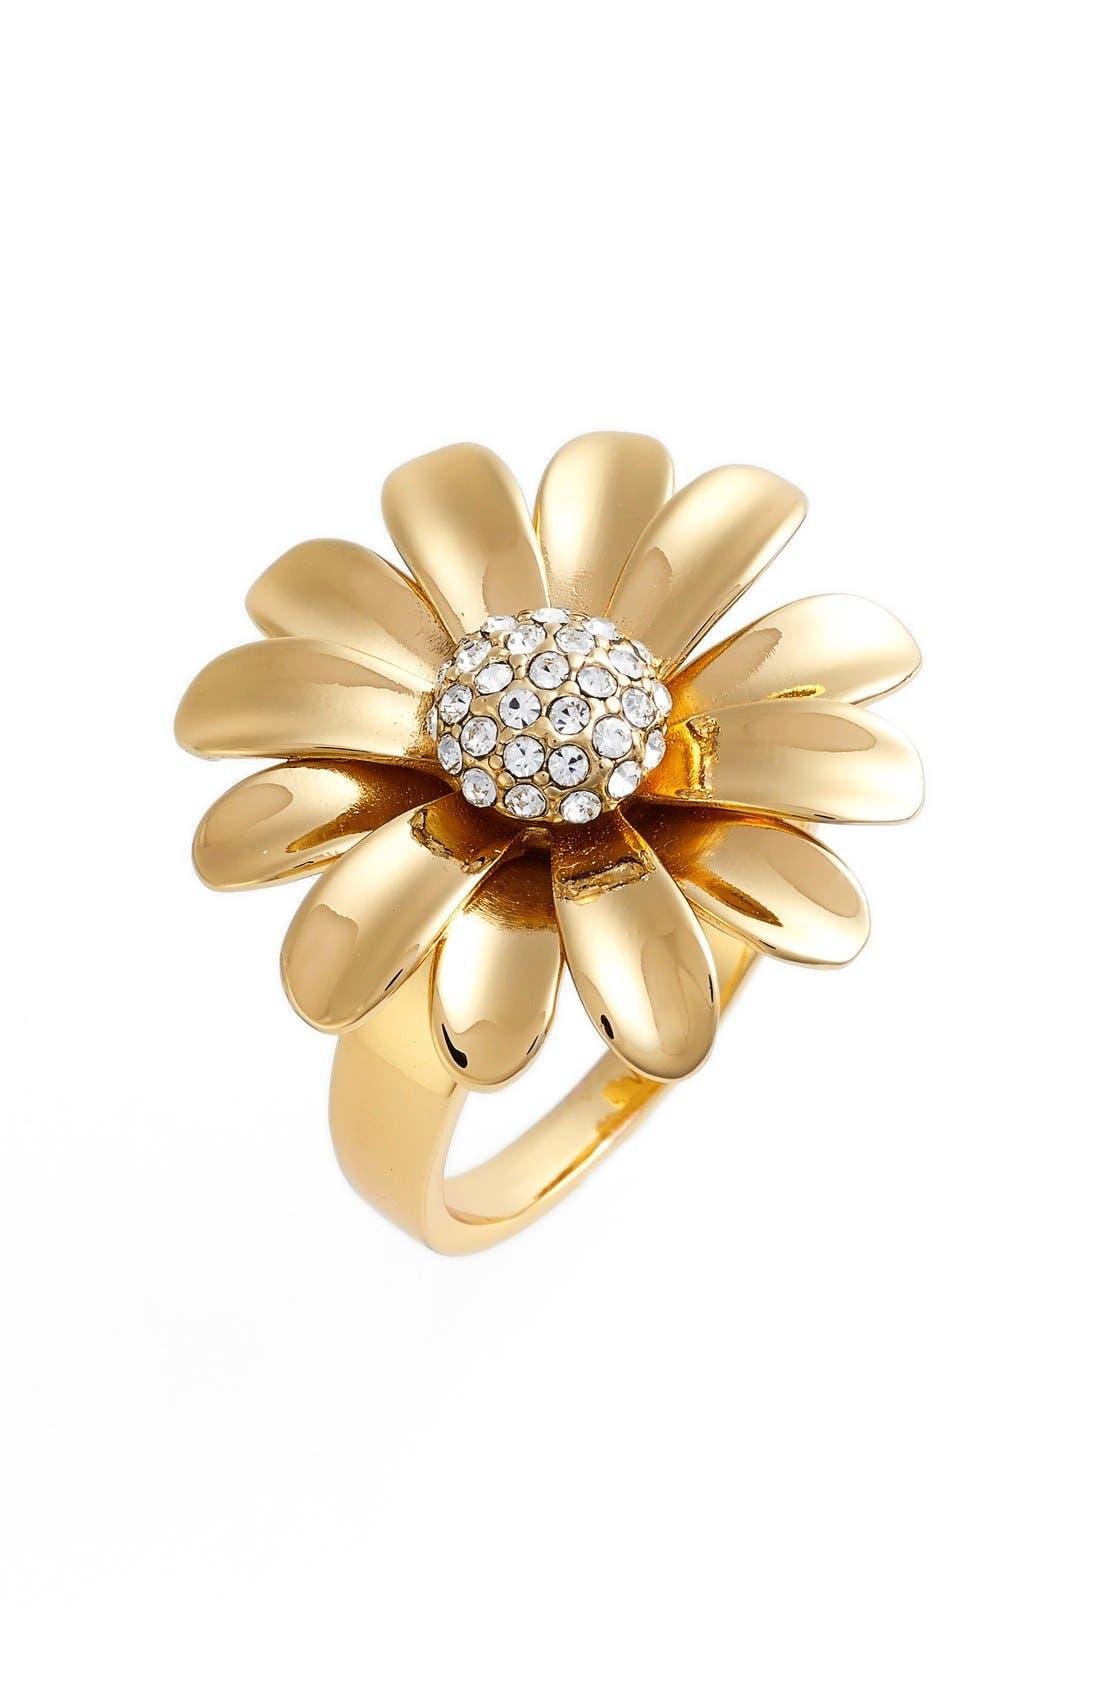 Main Image - kate spade new york 'dazzling daisies' statement ring